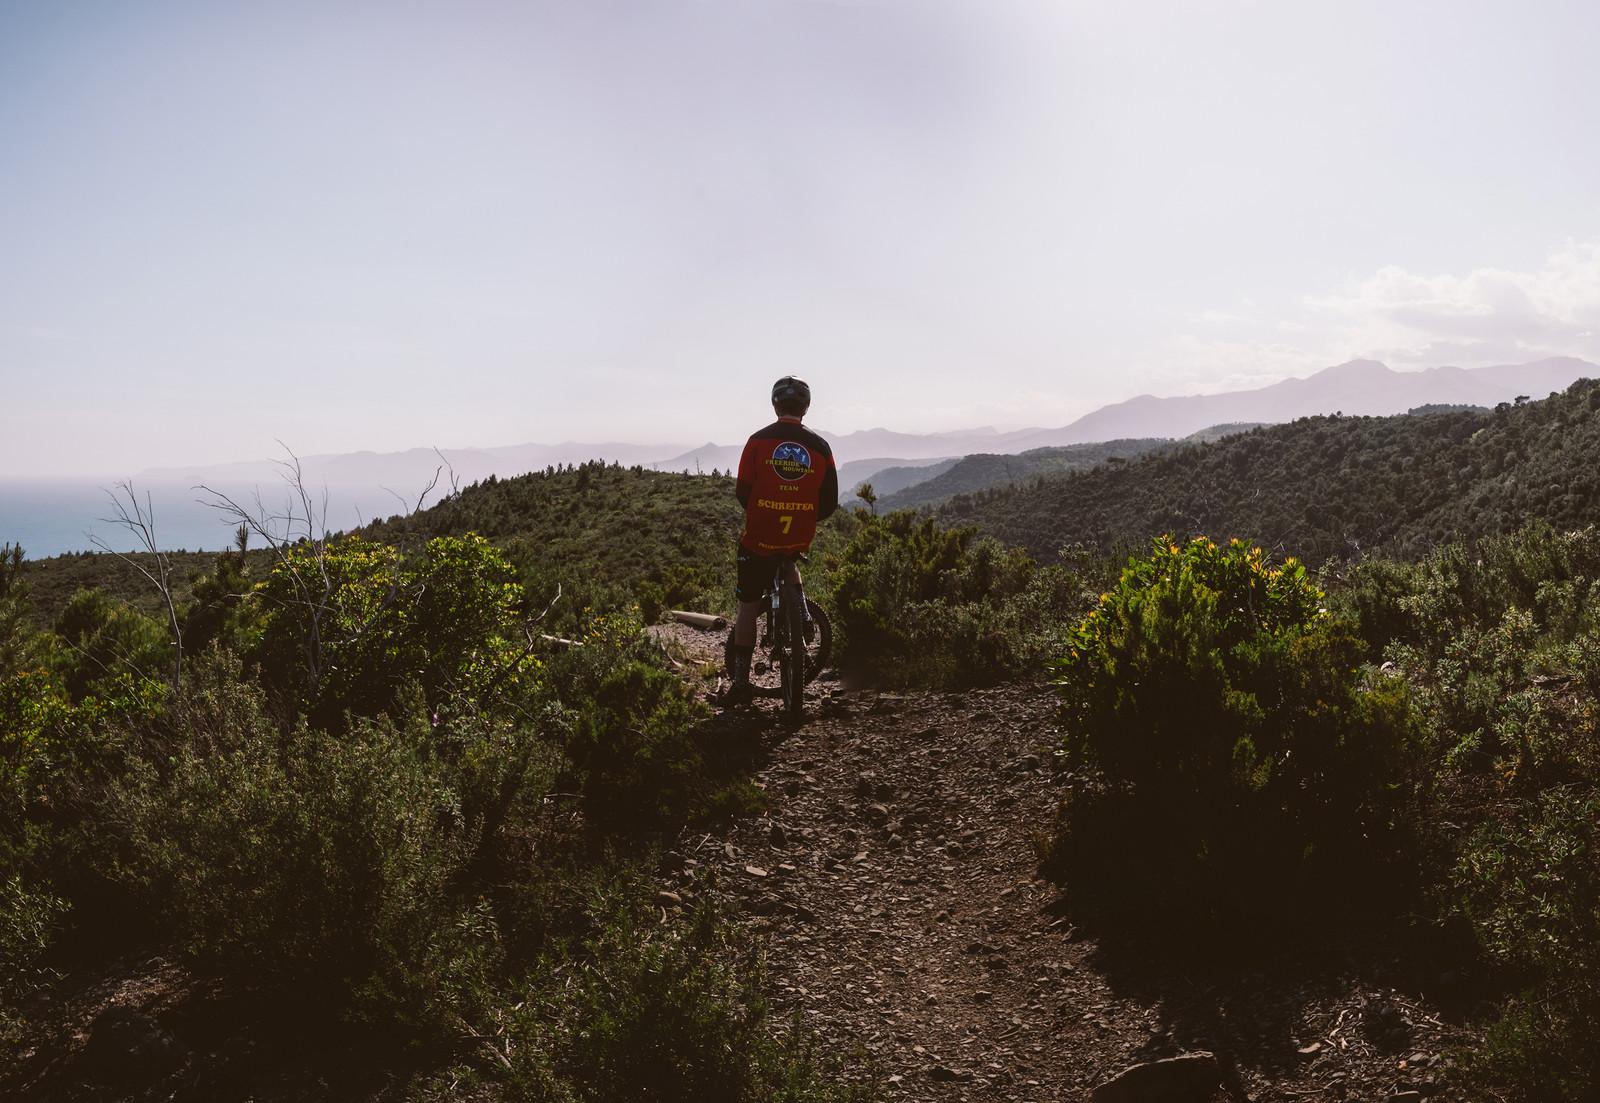 Panorama - Julian - Mountain Biking Pictures - Vital MTB